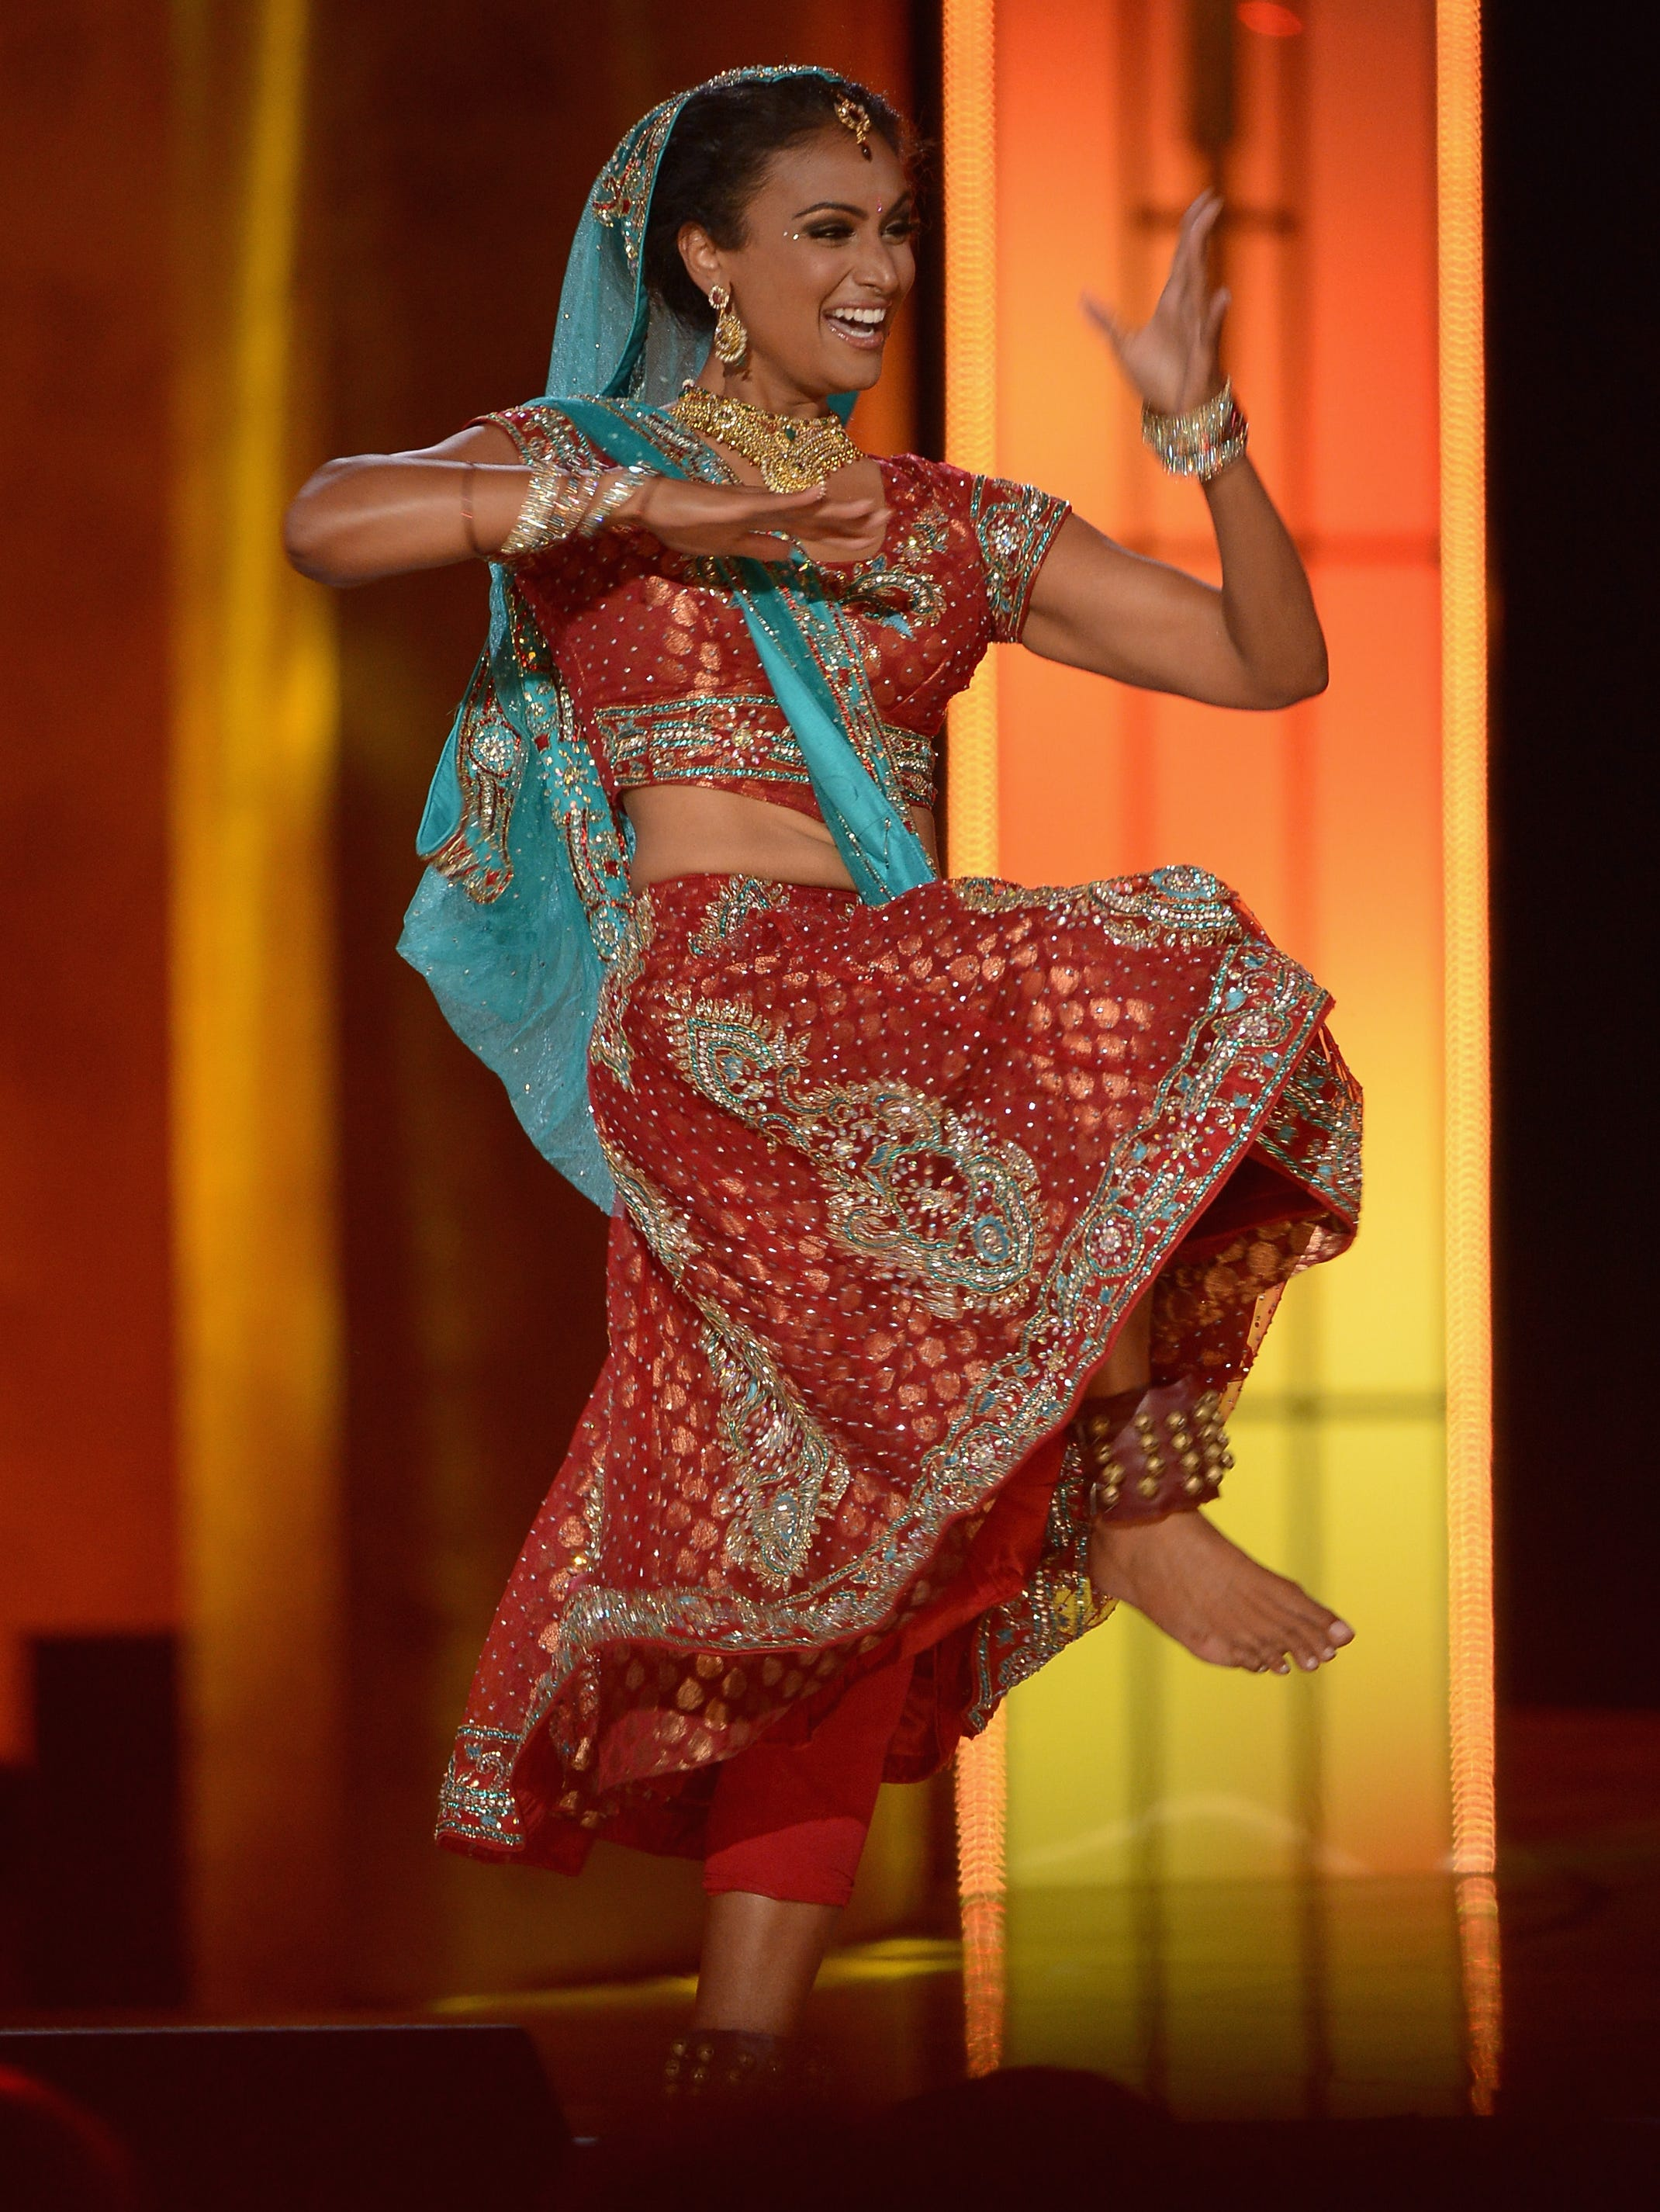 Miss America Nina Davuluri brushes off racist remarks